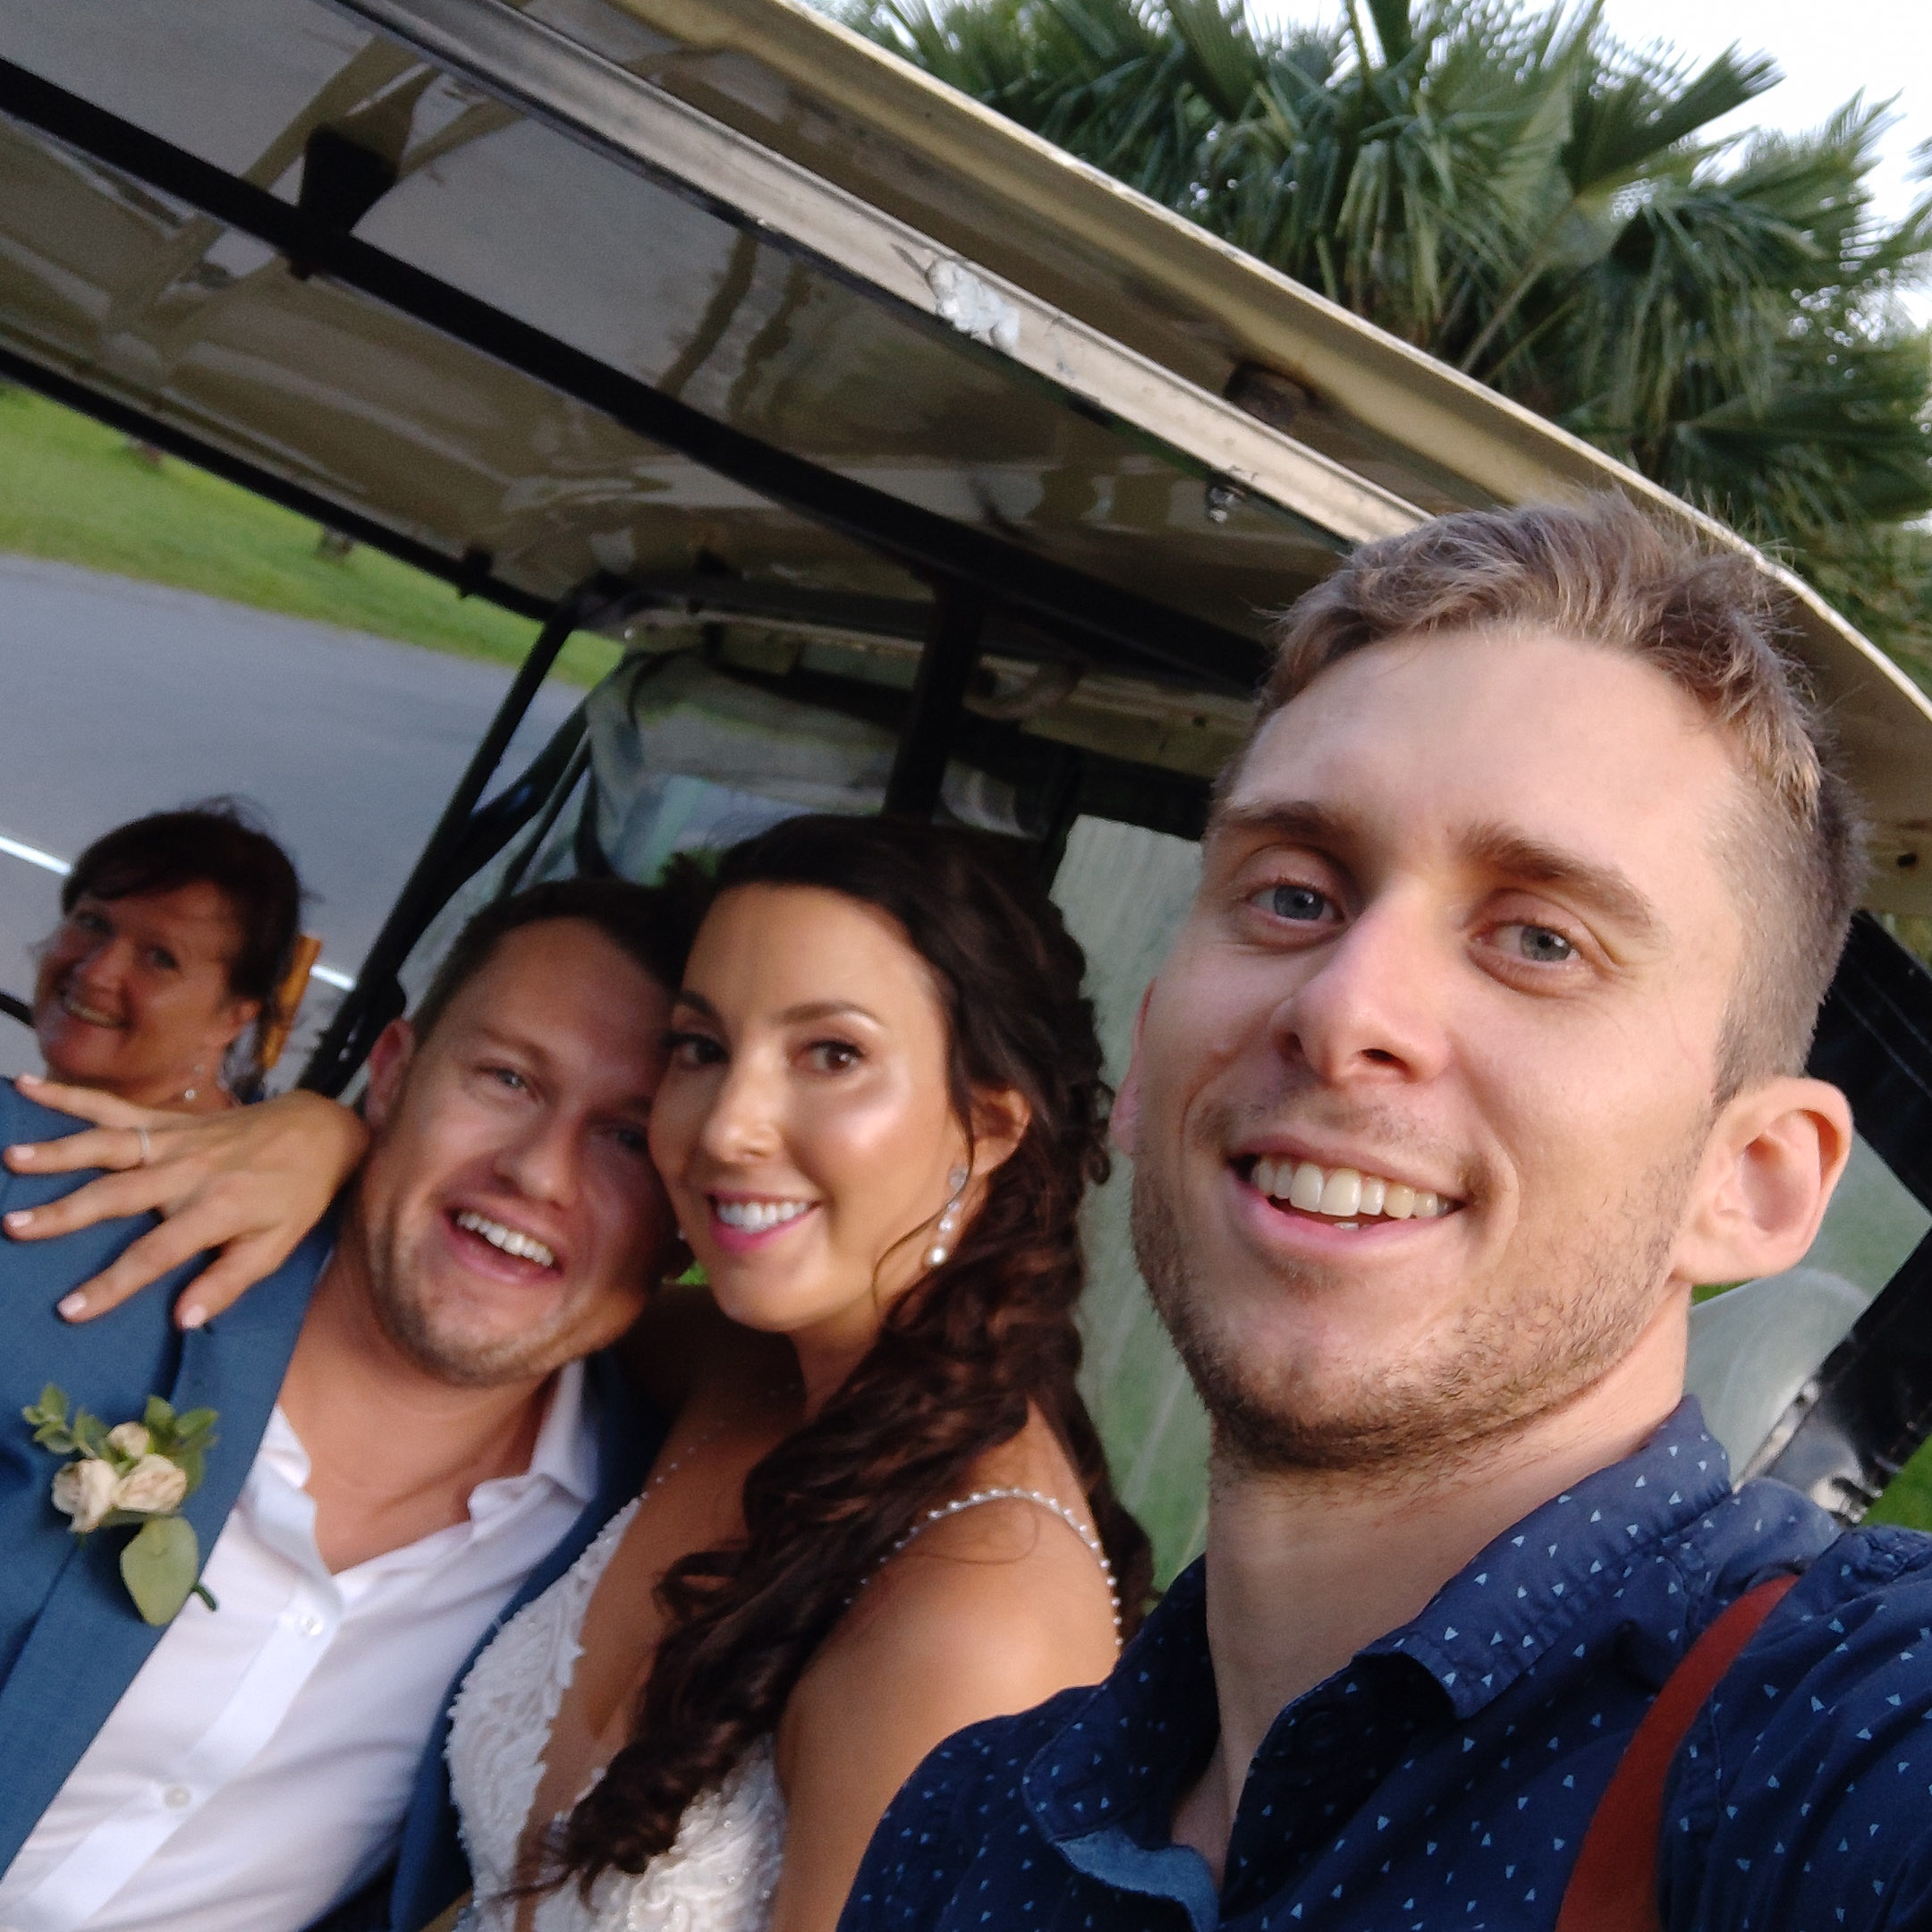 The-raw-photographer-cairns-wedding-photography-bridalparty-selfie-3.jpg